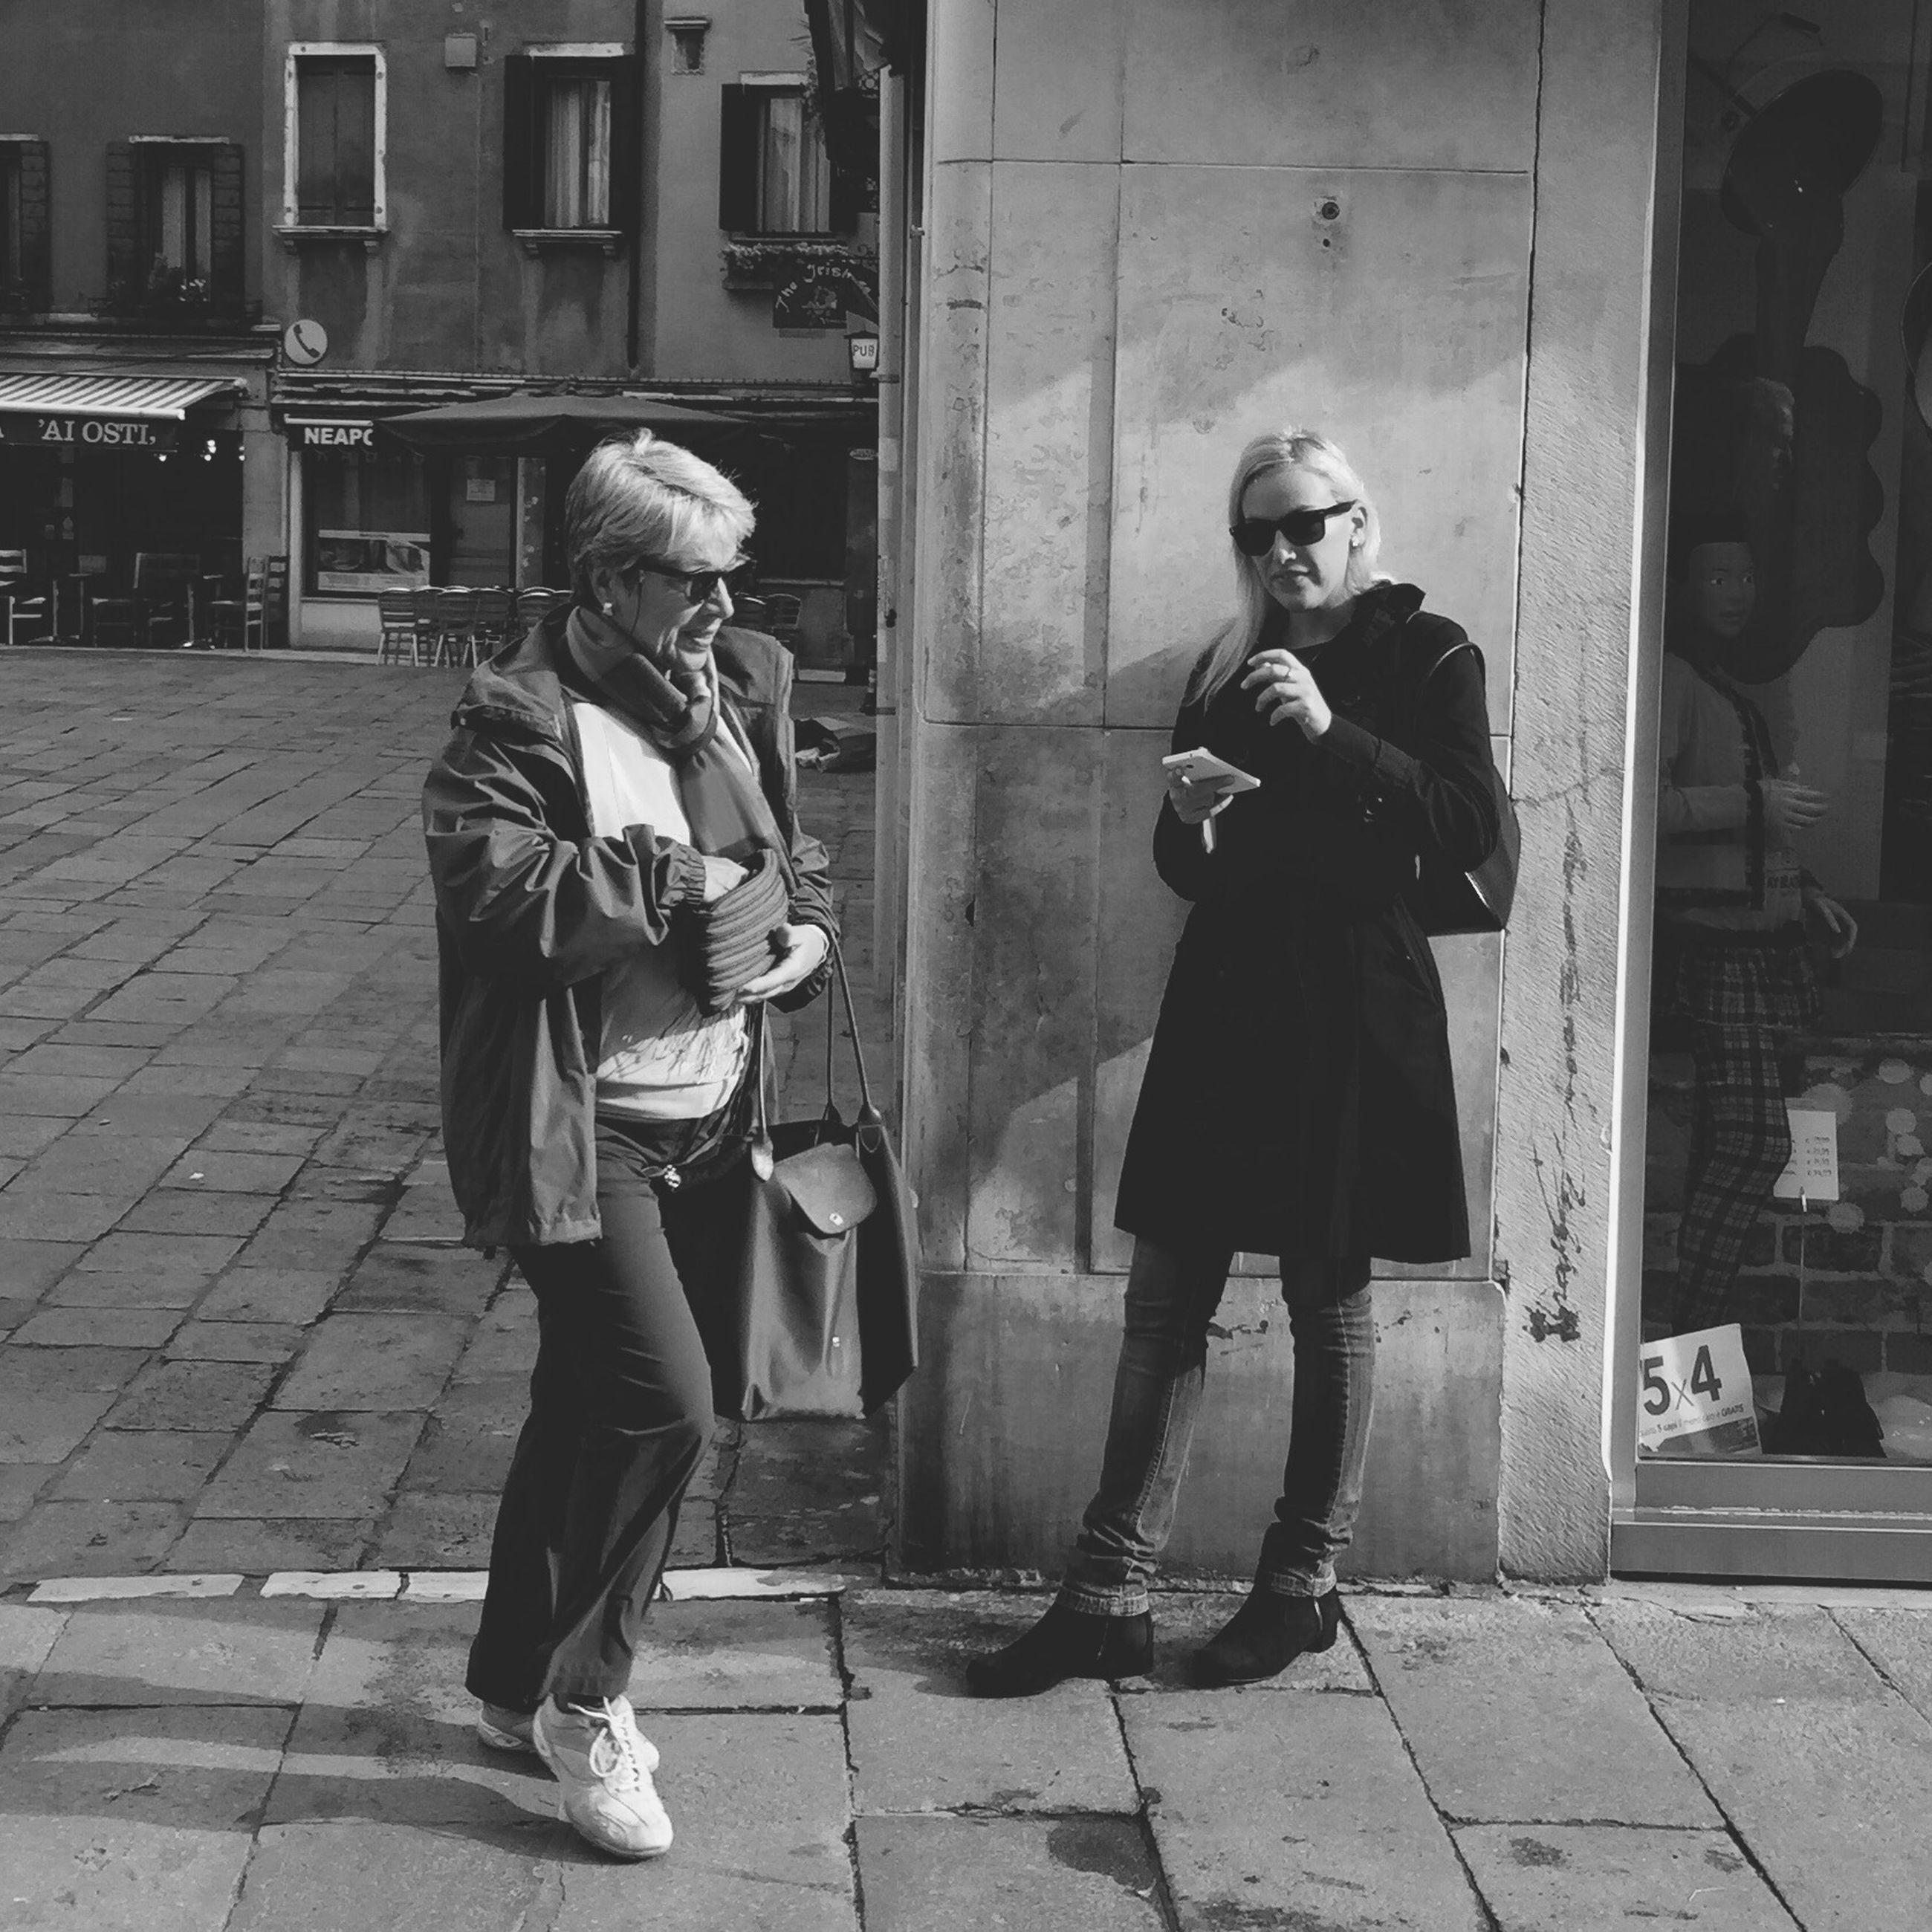 Streetphotography Blackandwhite Streetphoto_bw Venice